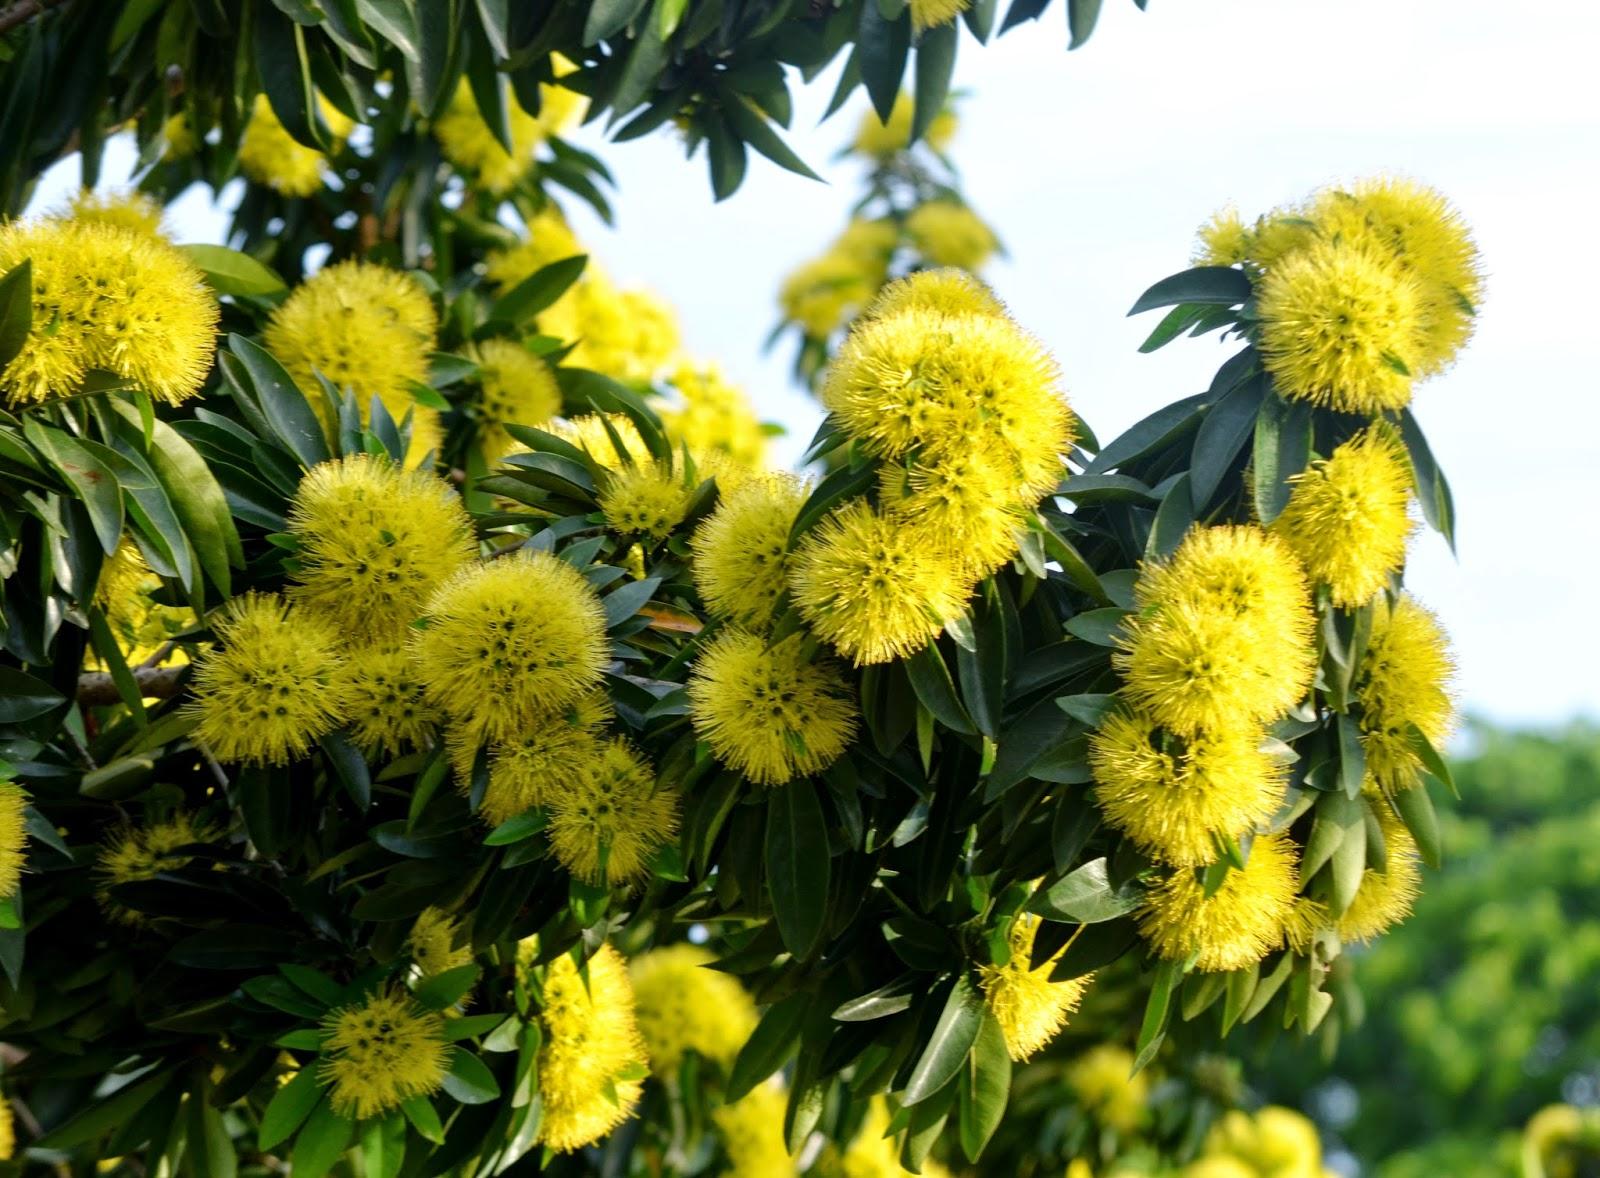 Flowers of the Golden Penda Plant